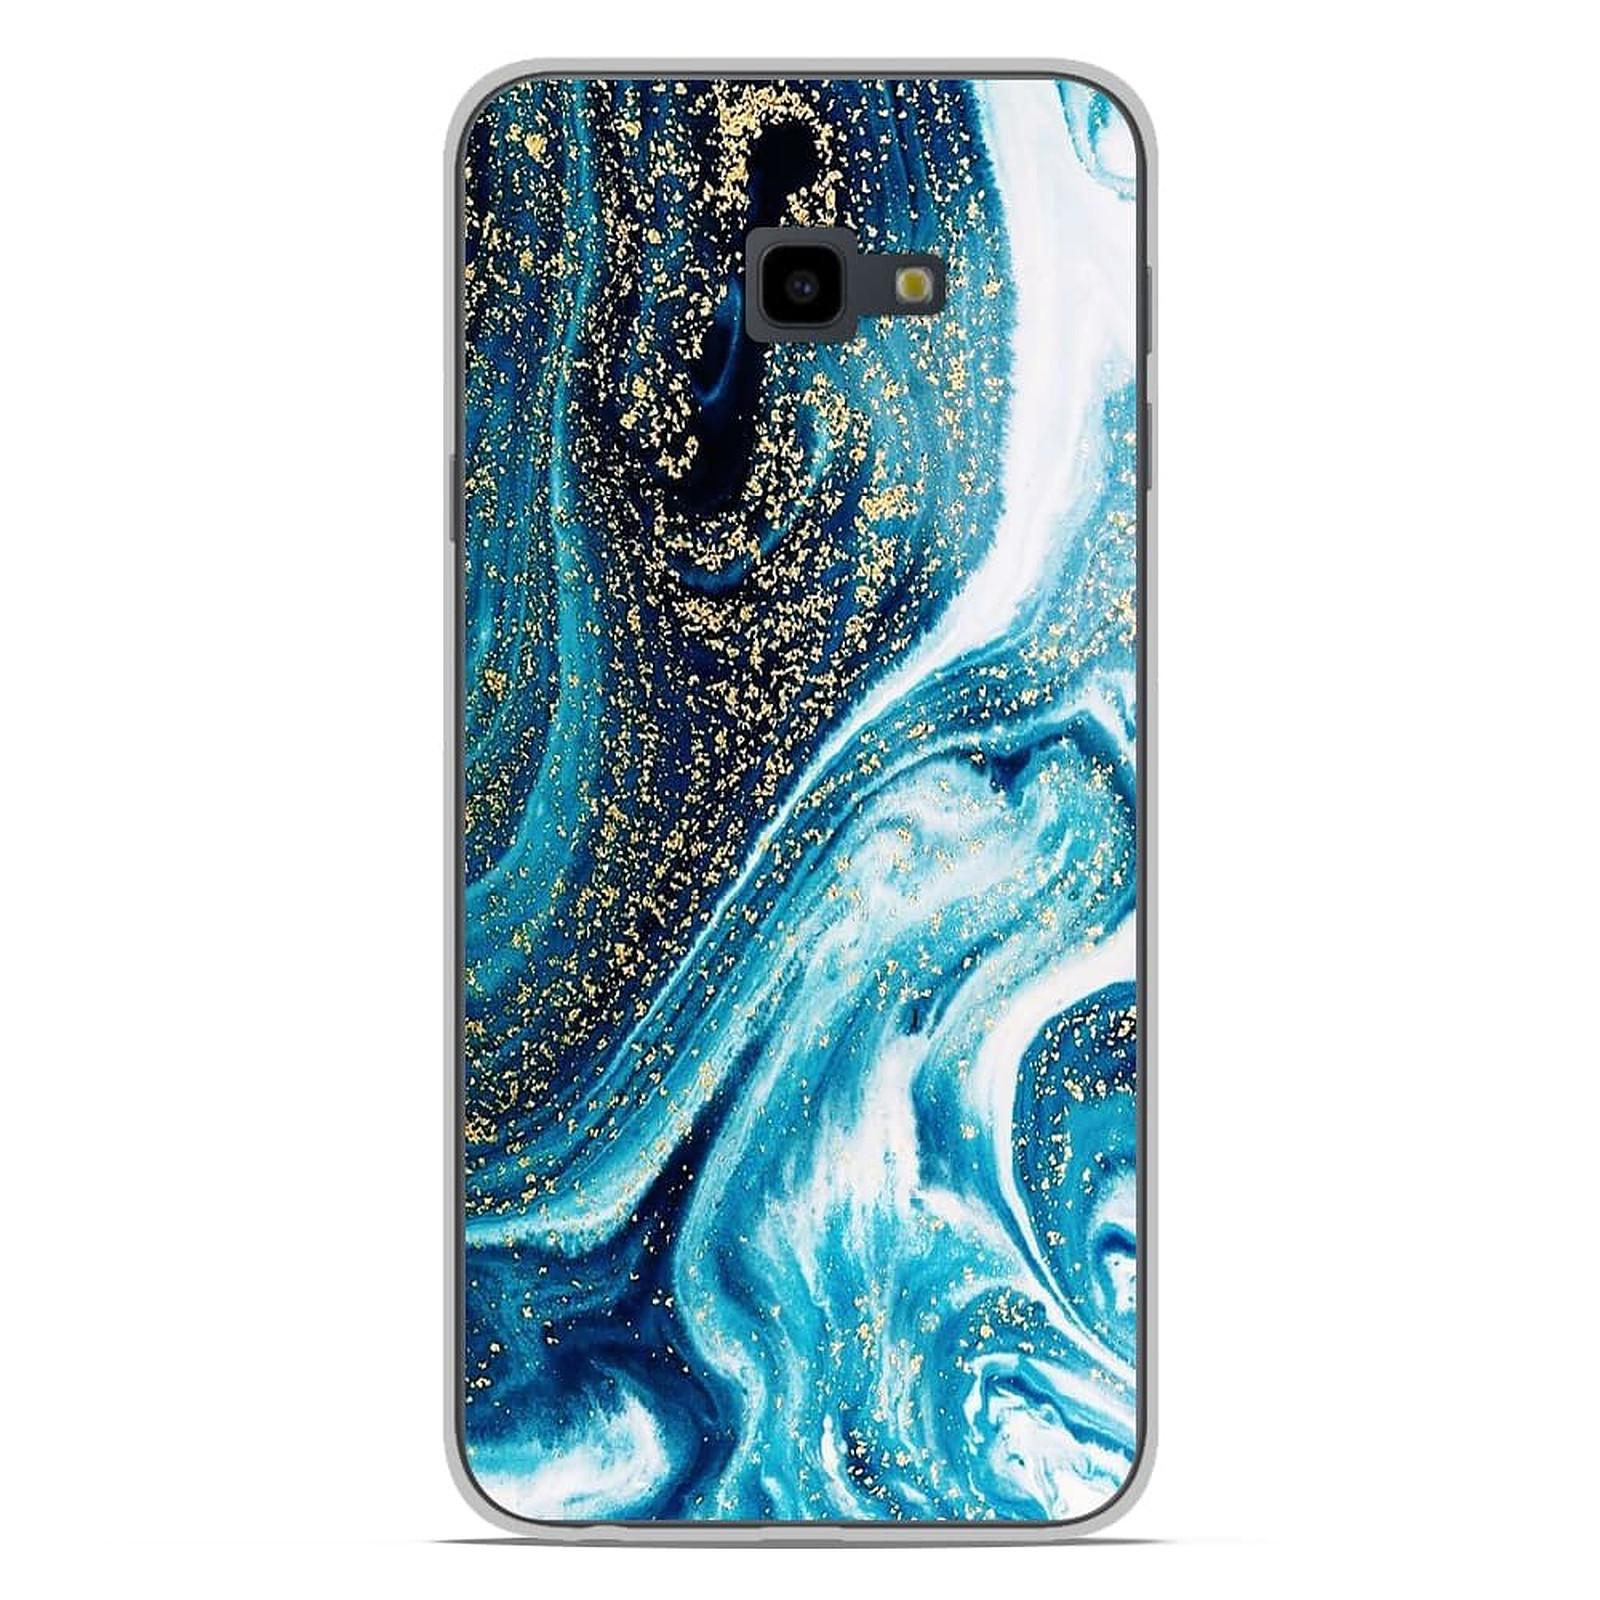 1001 Coques Coque silicone gel Samsung Galaxy J4 Plus 2018 motif Marbre Bleu Pailleté